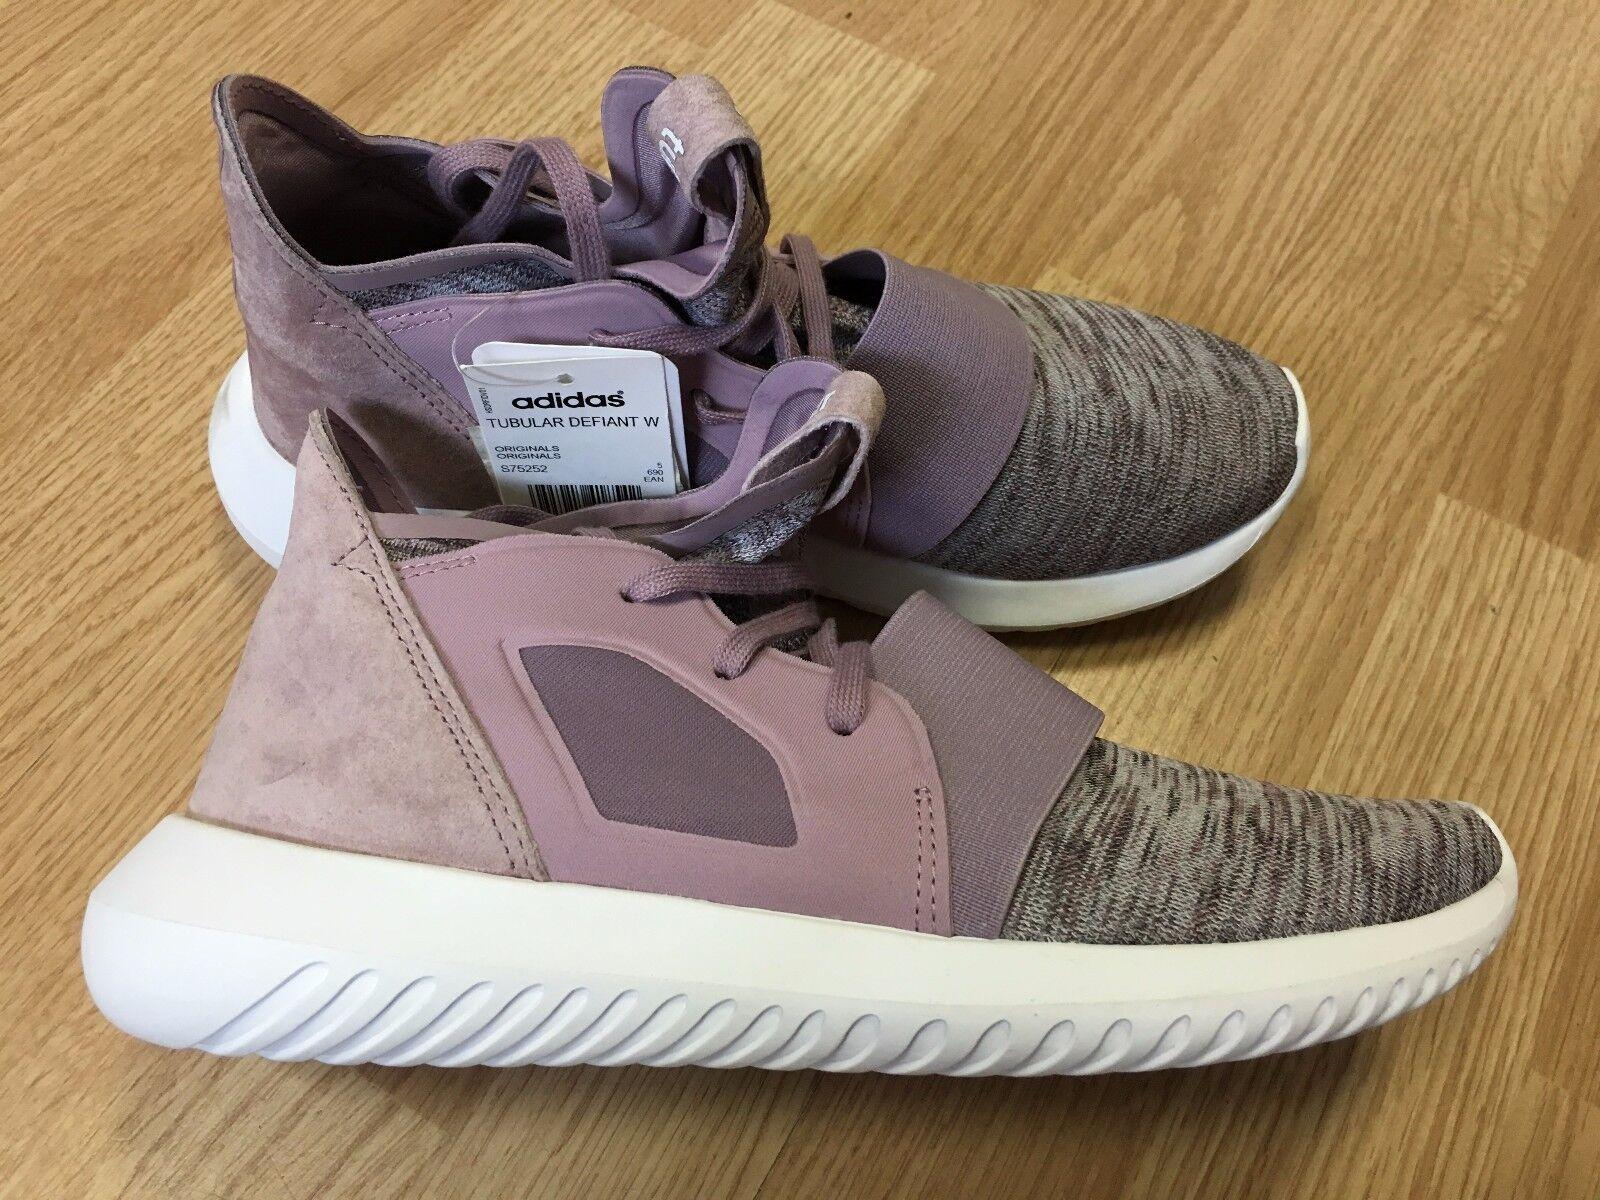 Adidas Originals Sneaker S75252 Damen TUBULAR DEFIANT